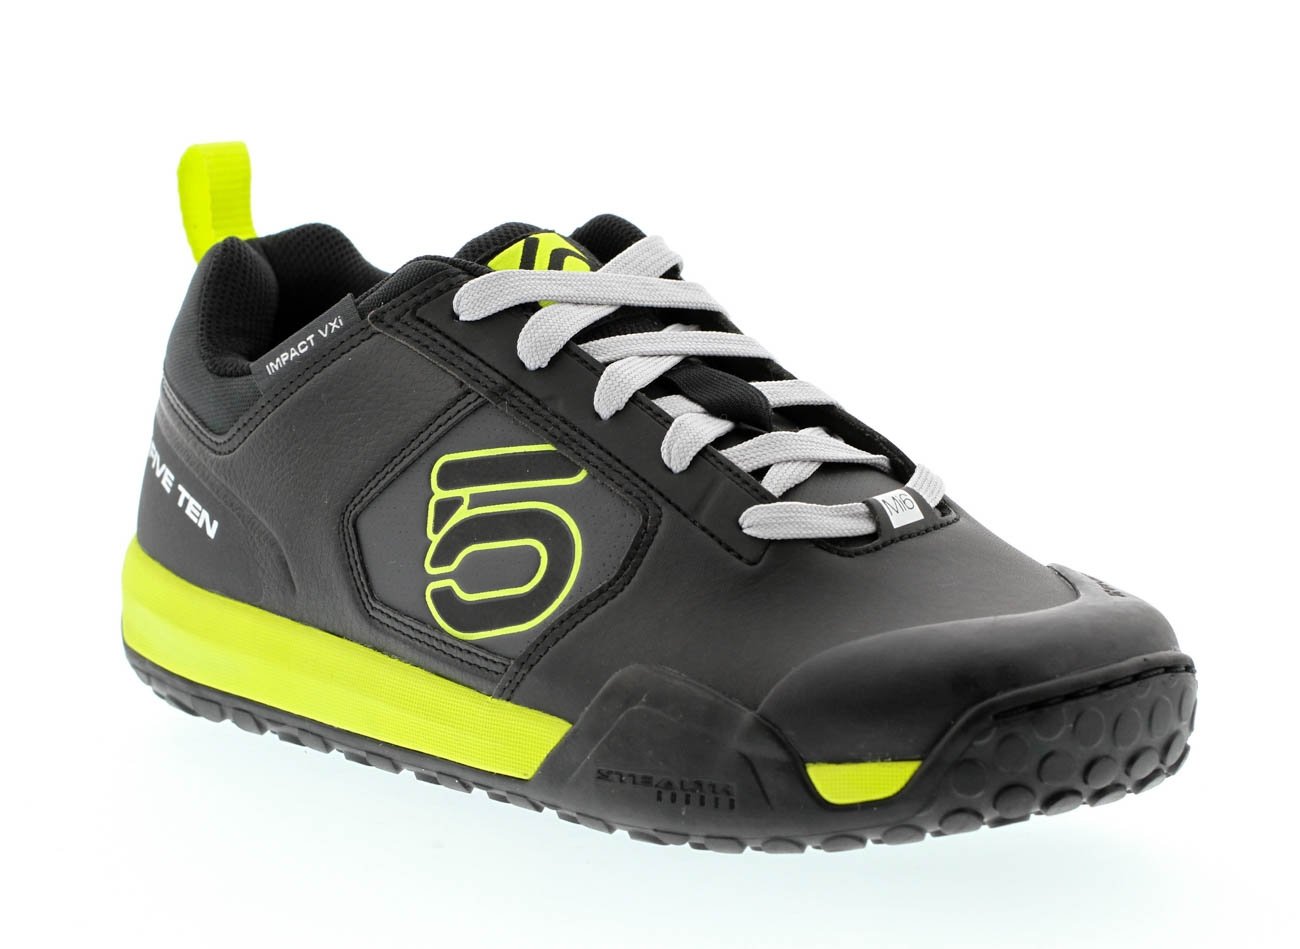 Chaussures Five Ten IMPACT VXI Noir/Jaune - UK-9.0 (43.0)